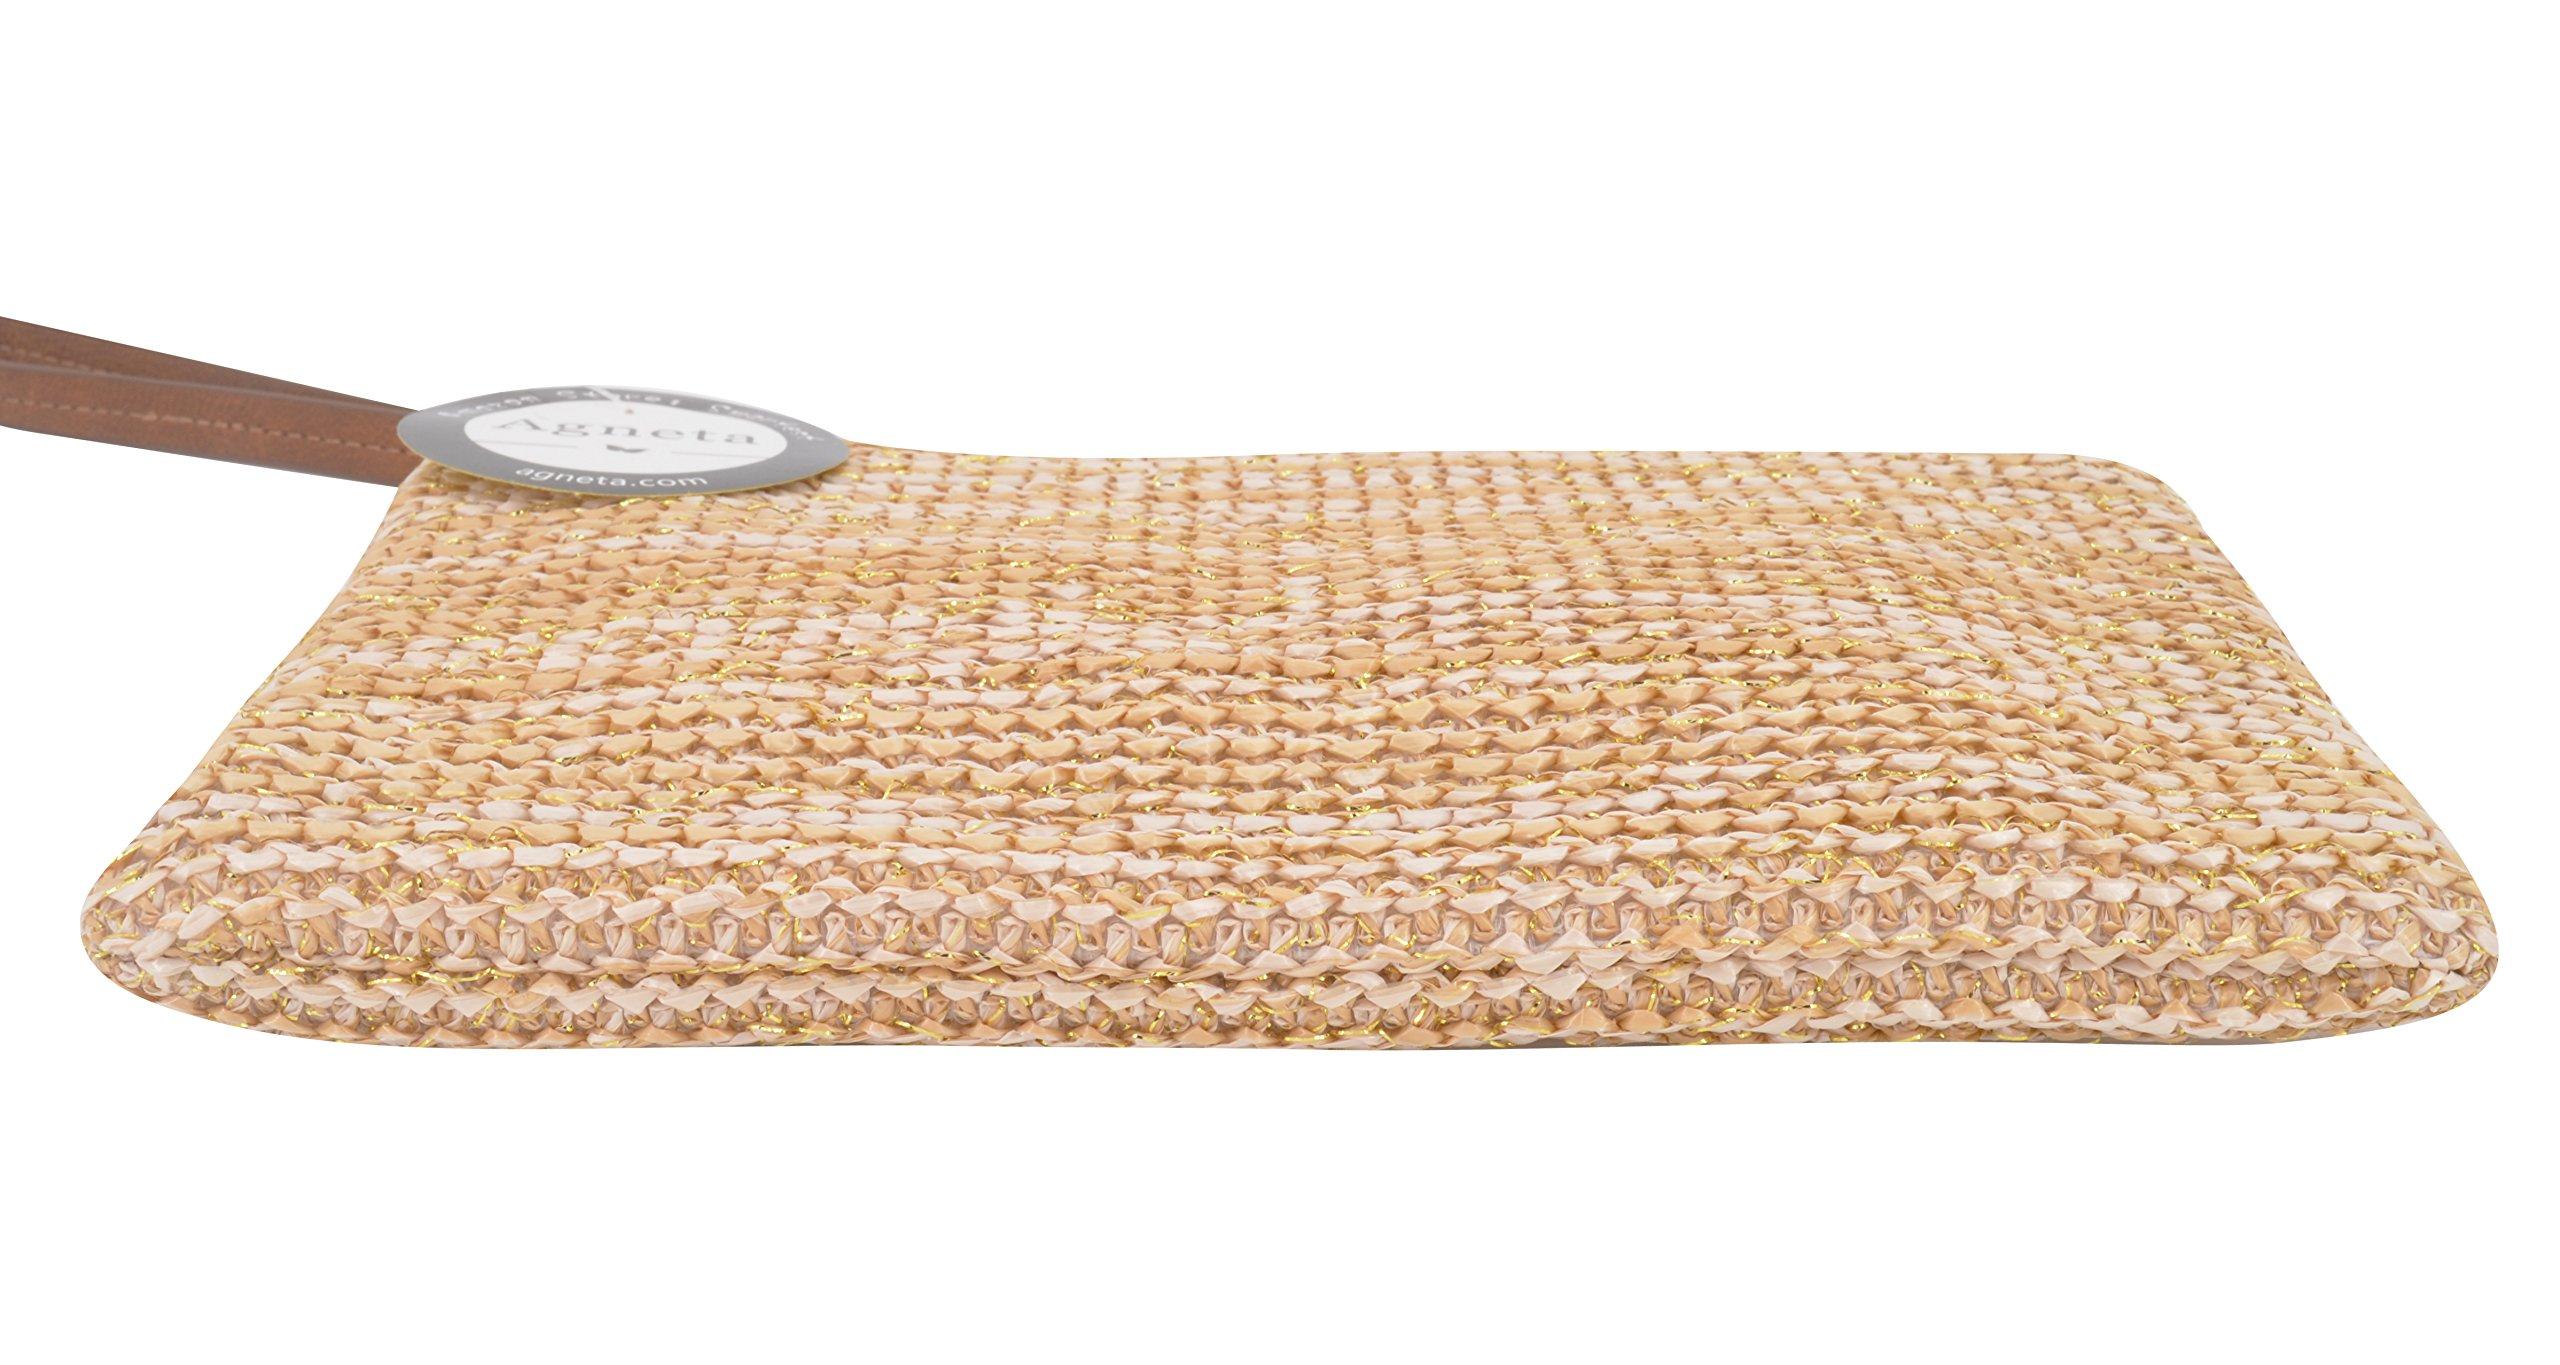 AGNETA Women's Hand Wrist Type Straw Clutch Summer Beach Sea Handbag (Brown Large) by AGNETA (Image #6)